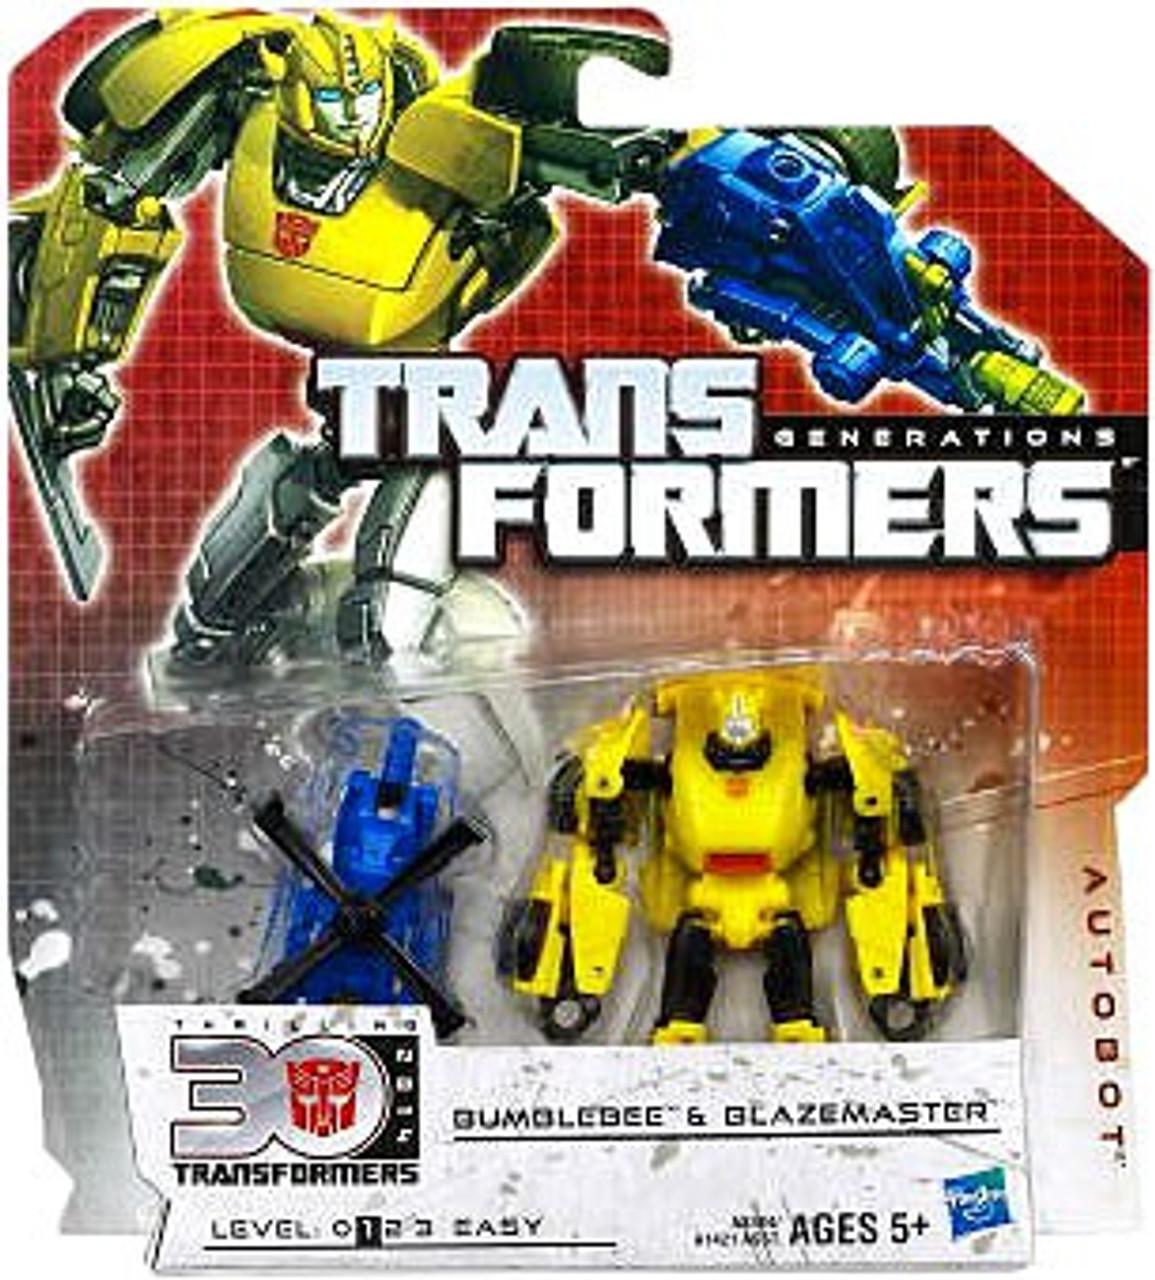 Transformers Generations 30th Anniversary Legends Bumblebee & Blazemaster Legend Action Figure 2-Pack